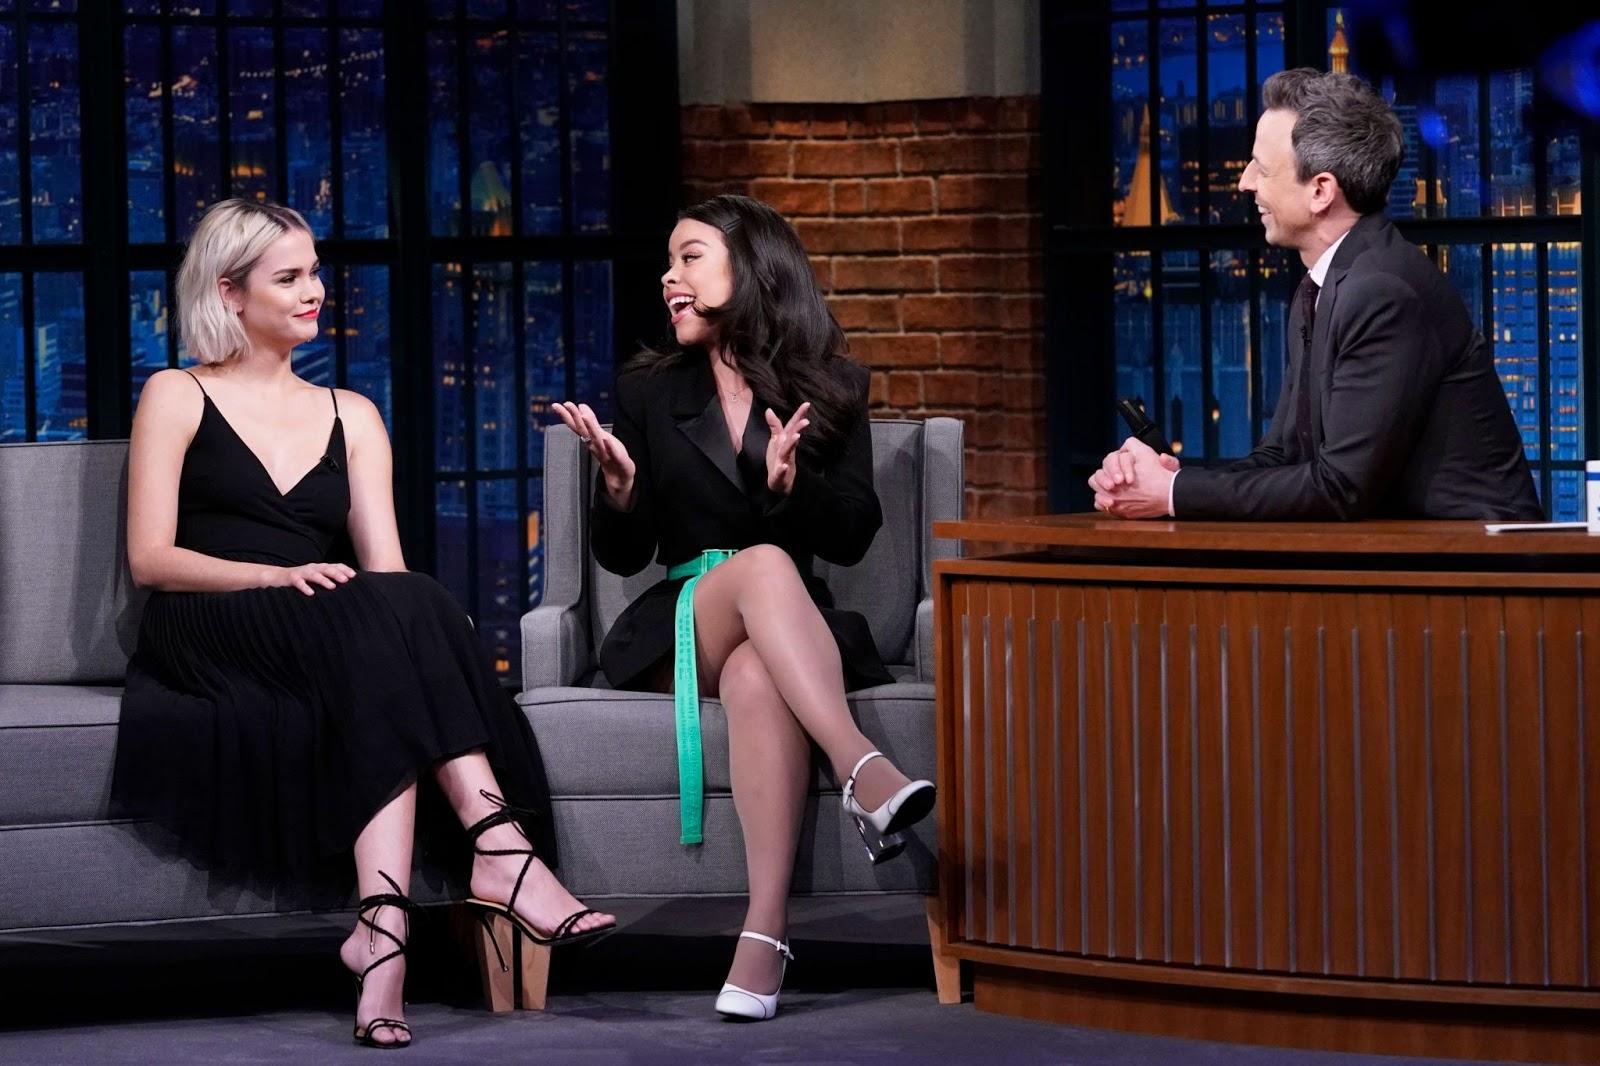 Maia Mitchell and Cierra Ramirez - Late Night with Seth Meyers - 01/28/2019